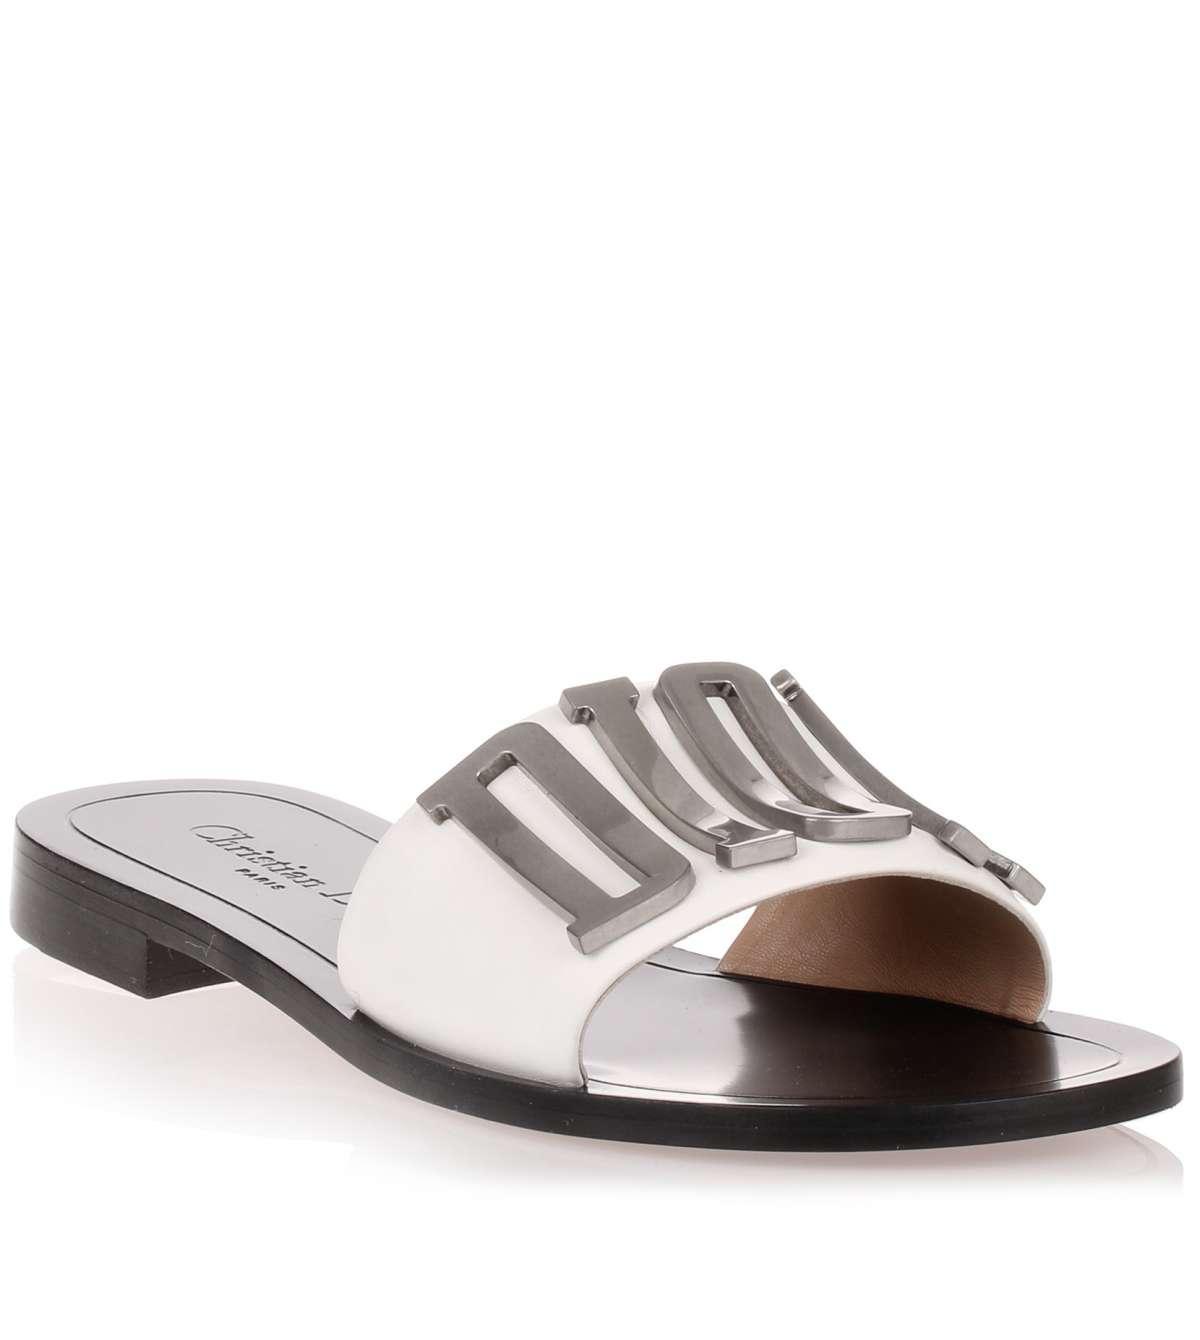 1fff9237d70 Lyst - Dior Evolution White Leather Slide Us in White